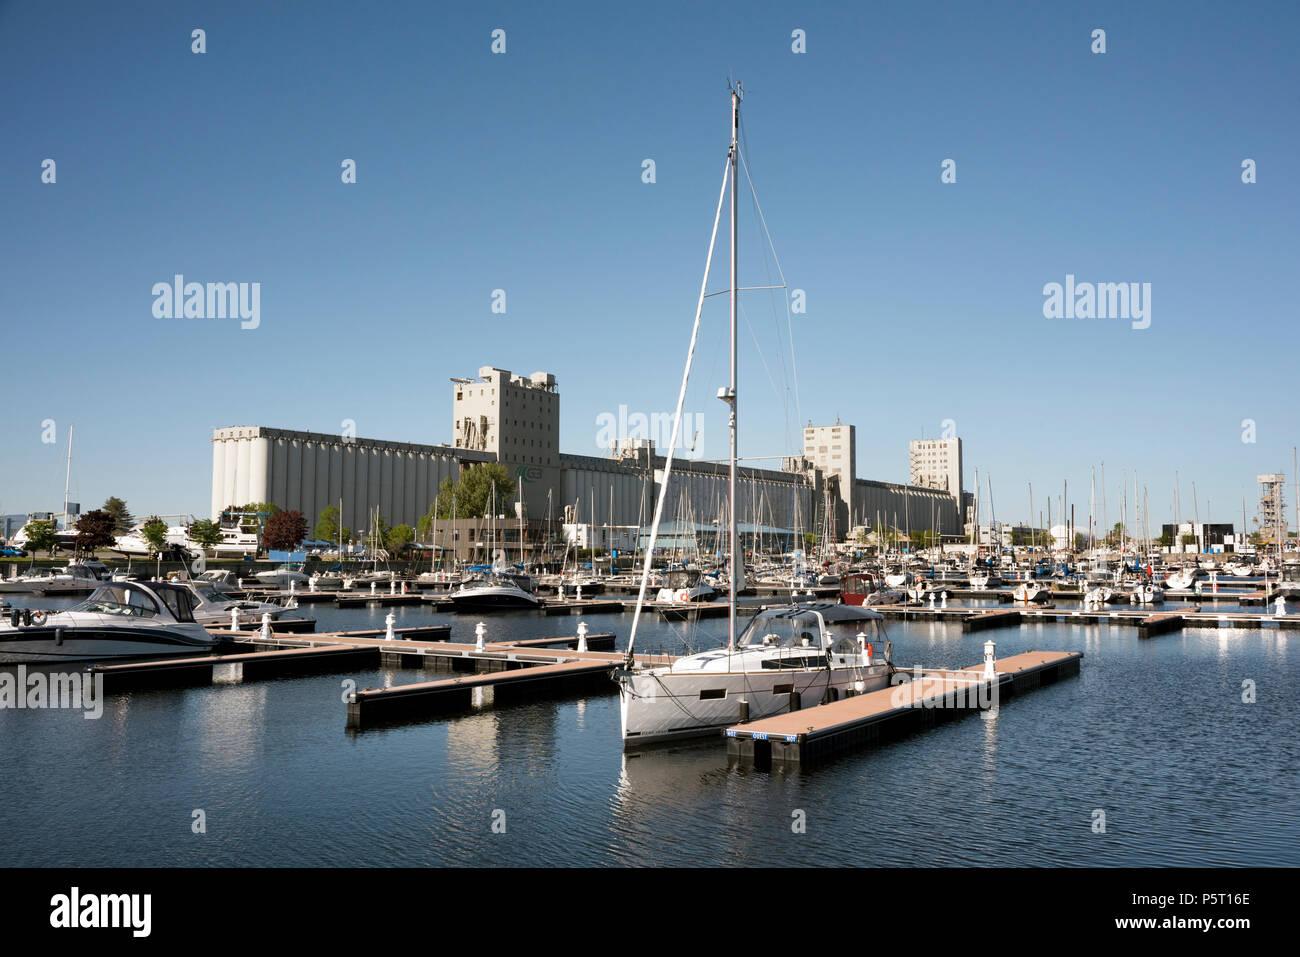 Bassin Louise marina, Quebec City, Canada. Grain silos seen to the rear. - Stock Image